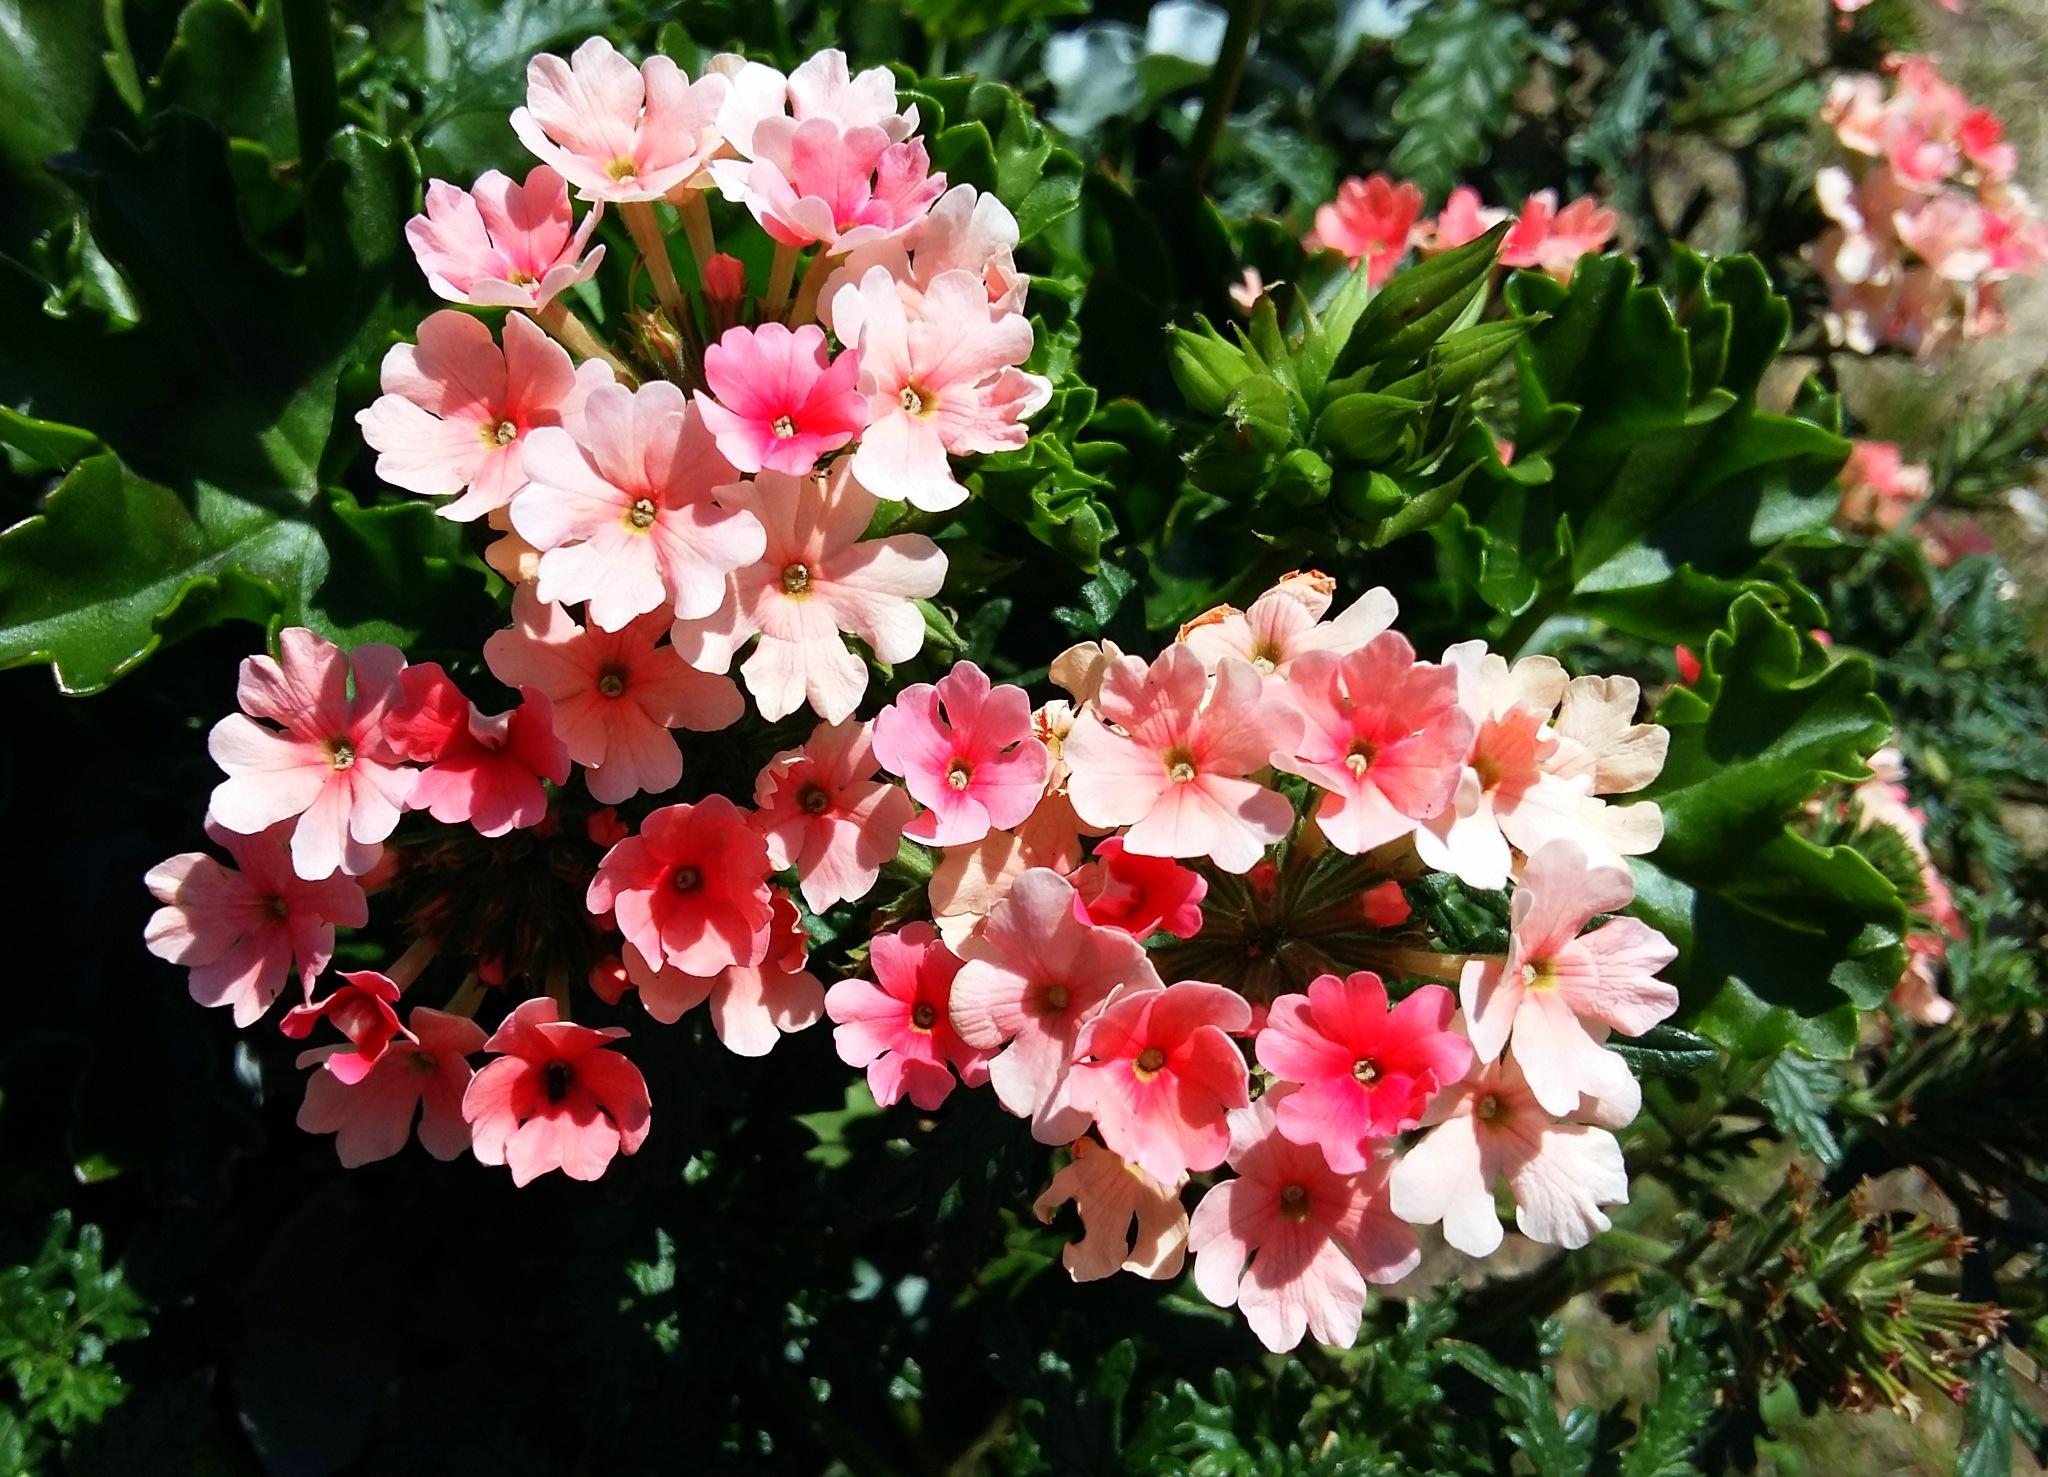 Small pink flowers. by uzkuraitiene62